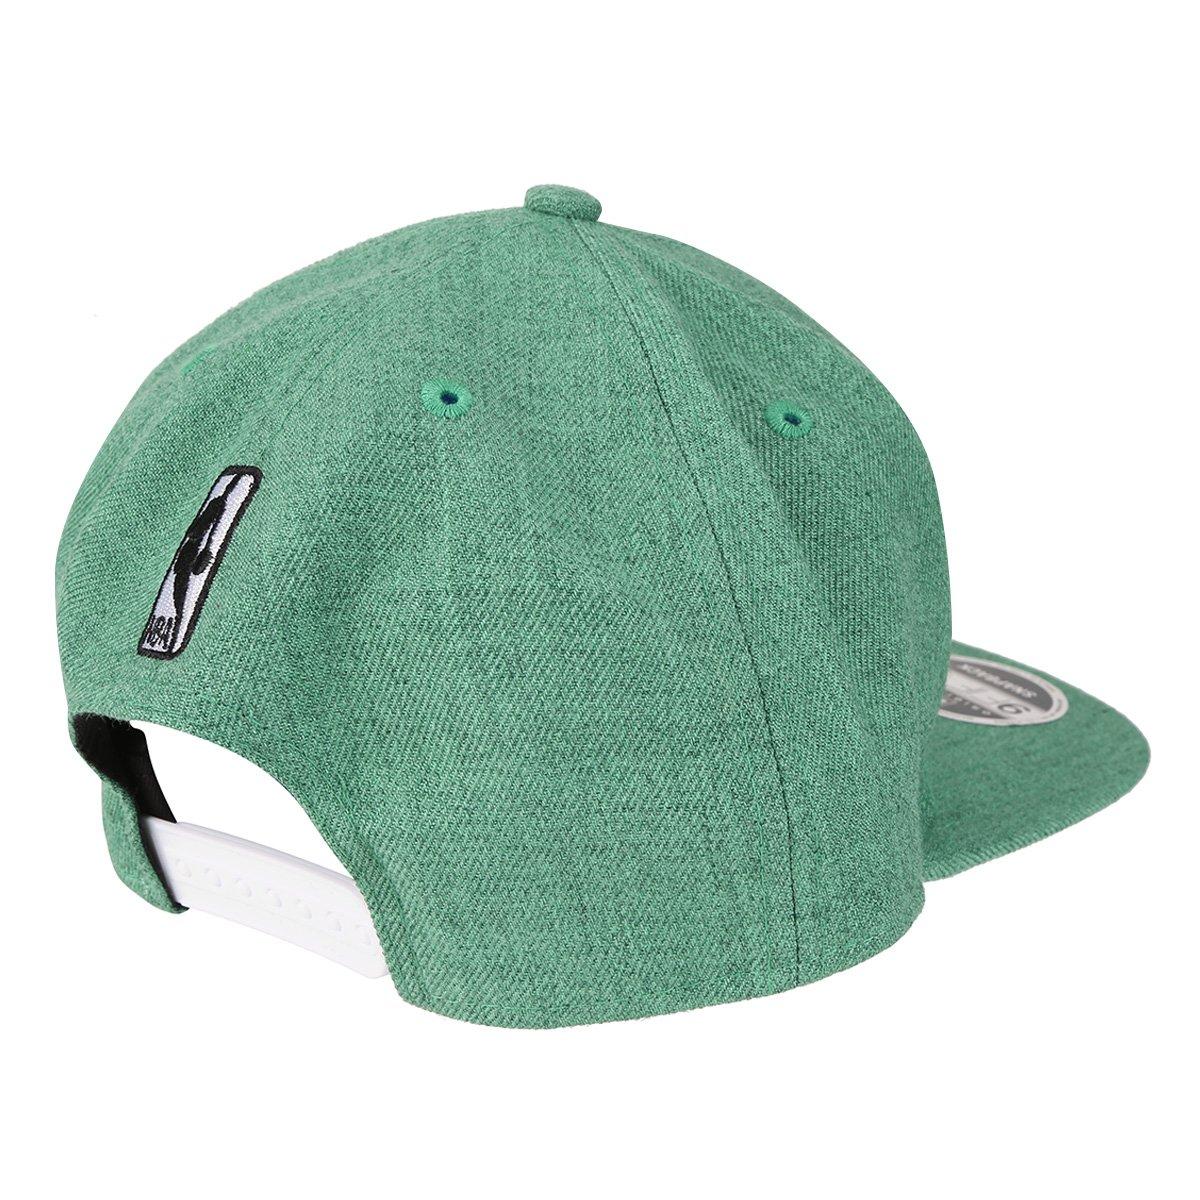 b314b05acb95c Boné New Era NBA Boston Celtics Aba Reta Washed Denim - Compre Agora ...